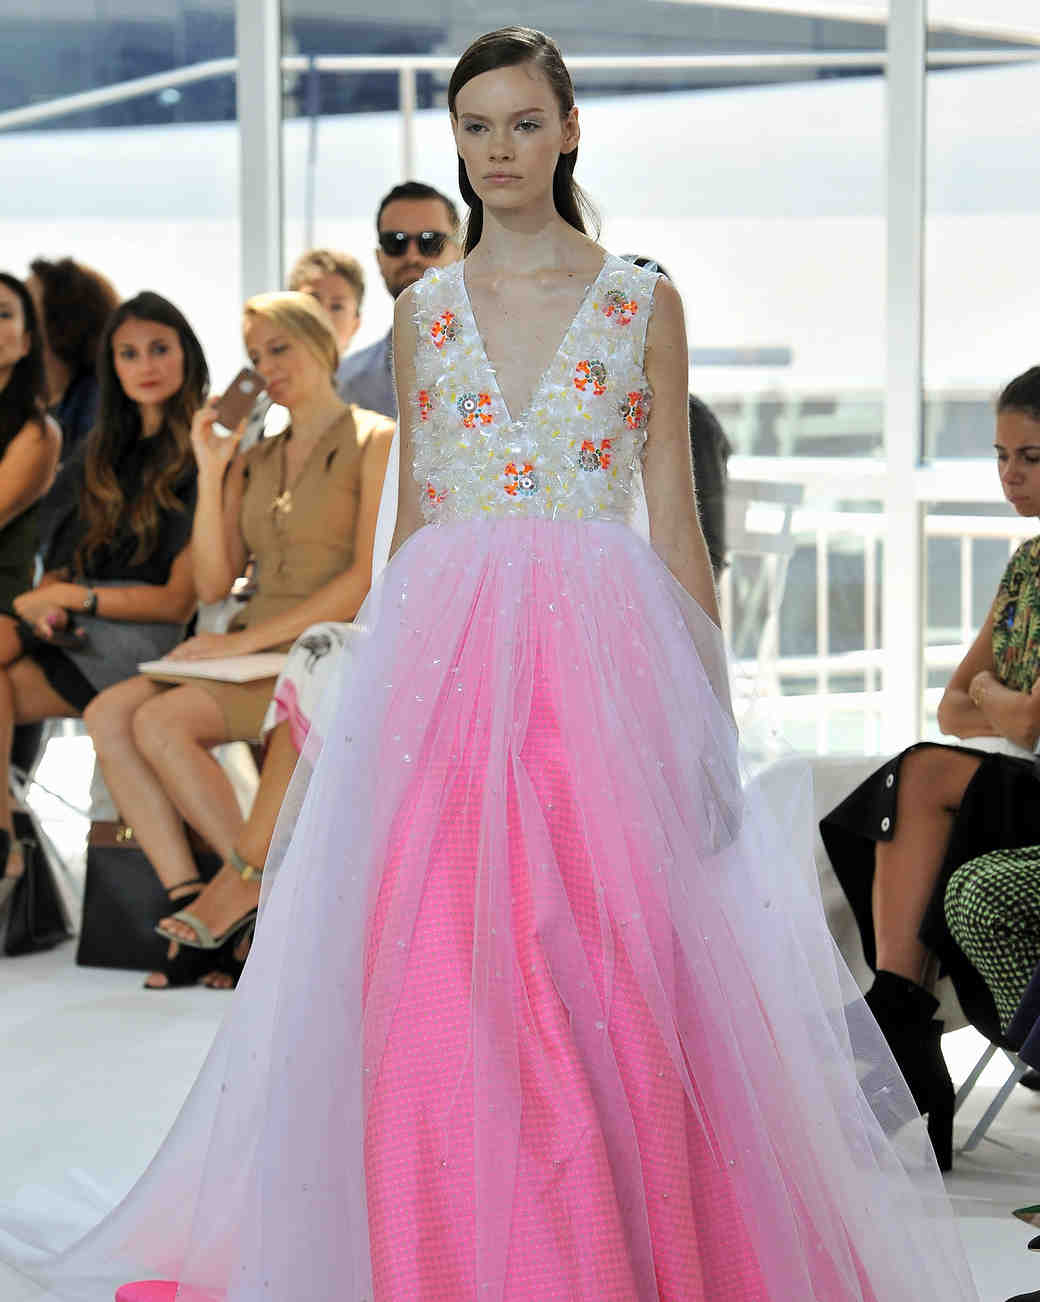 mindy-project-wedding-dress-delpozo-1015.jpg